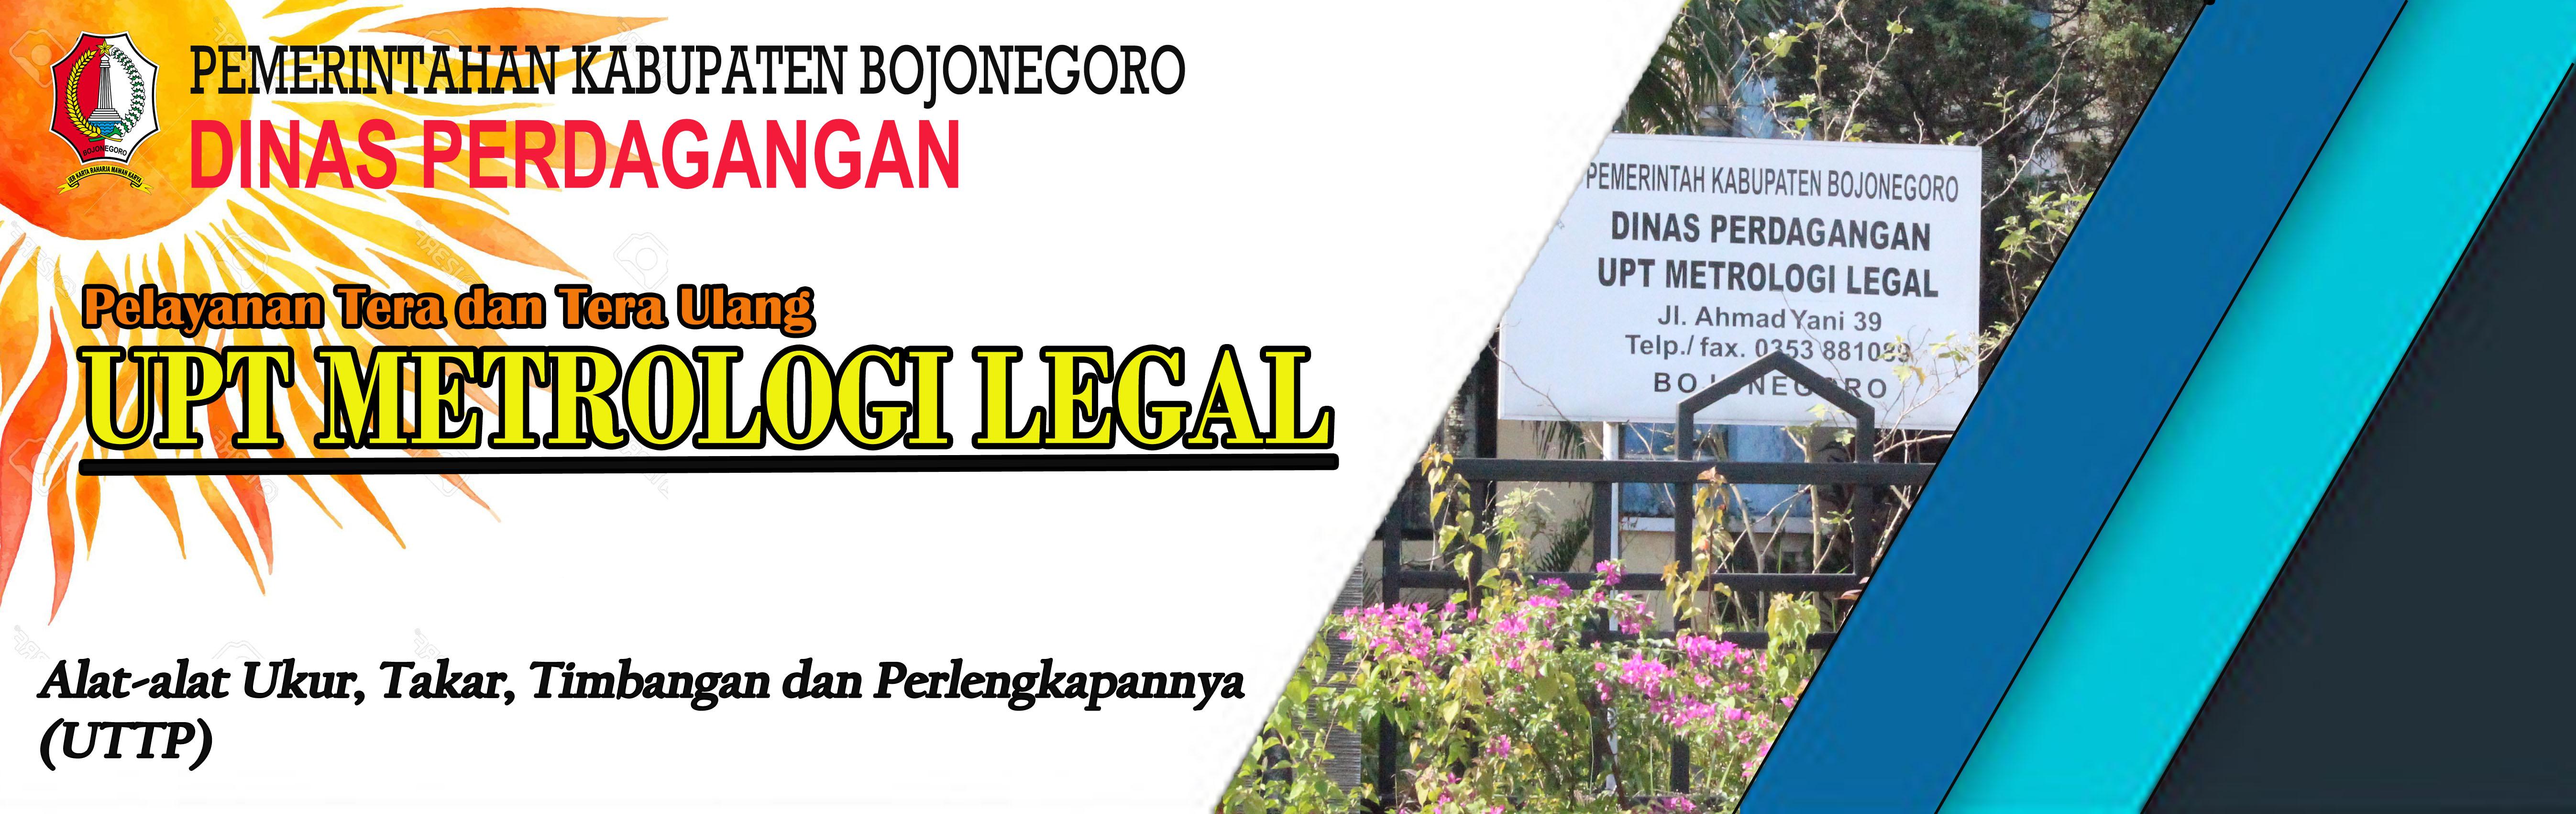 DINAS PERDAGANGAN<BR>Pelayanan Tera dan Tera Ulang UPT. Metrologi Legal